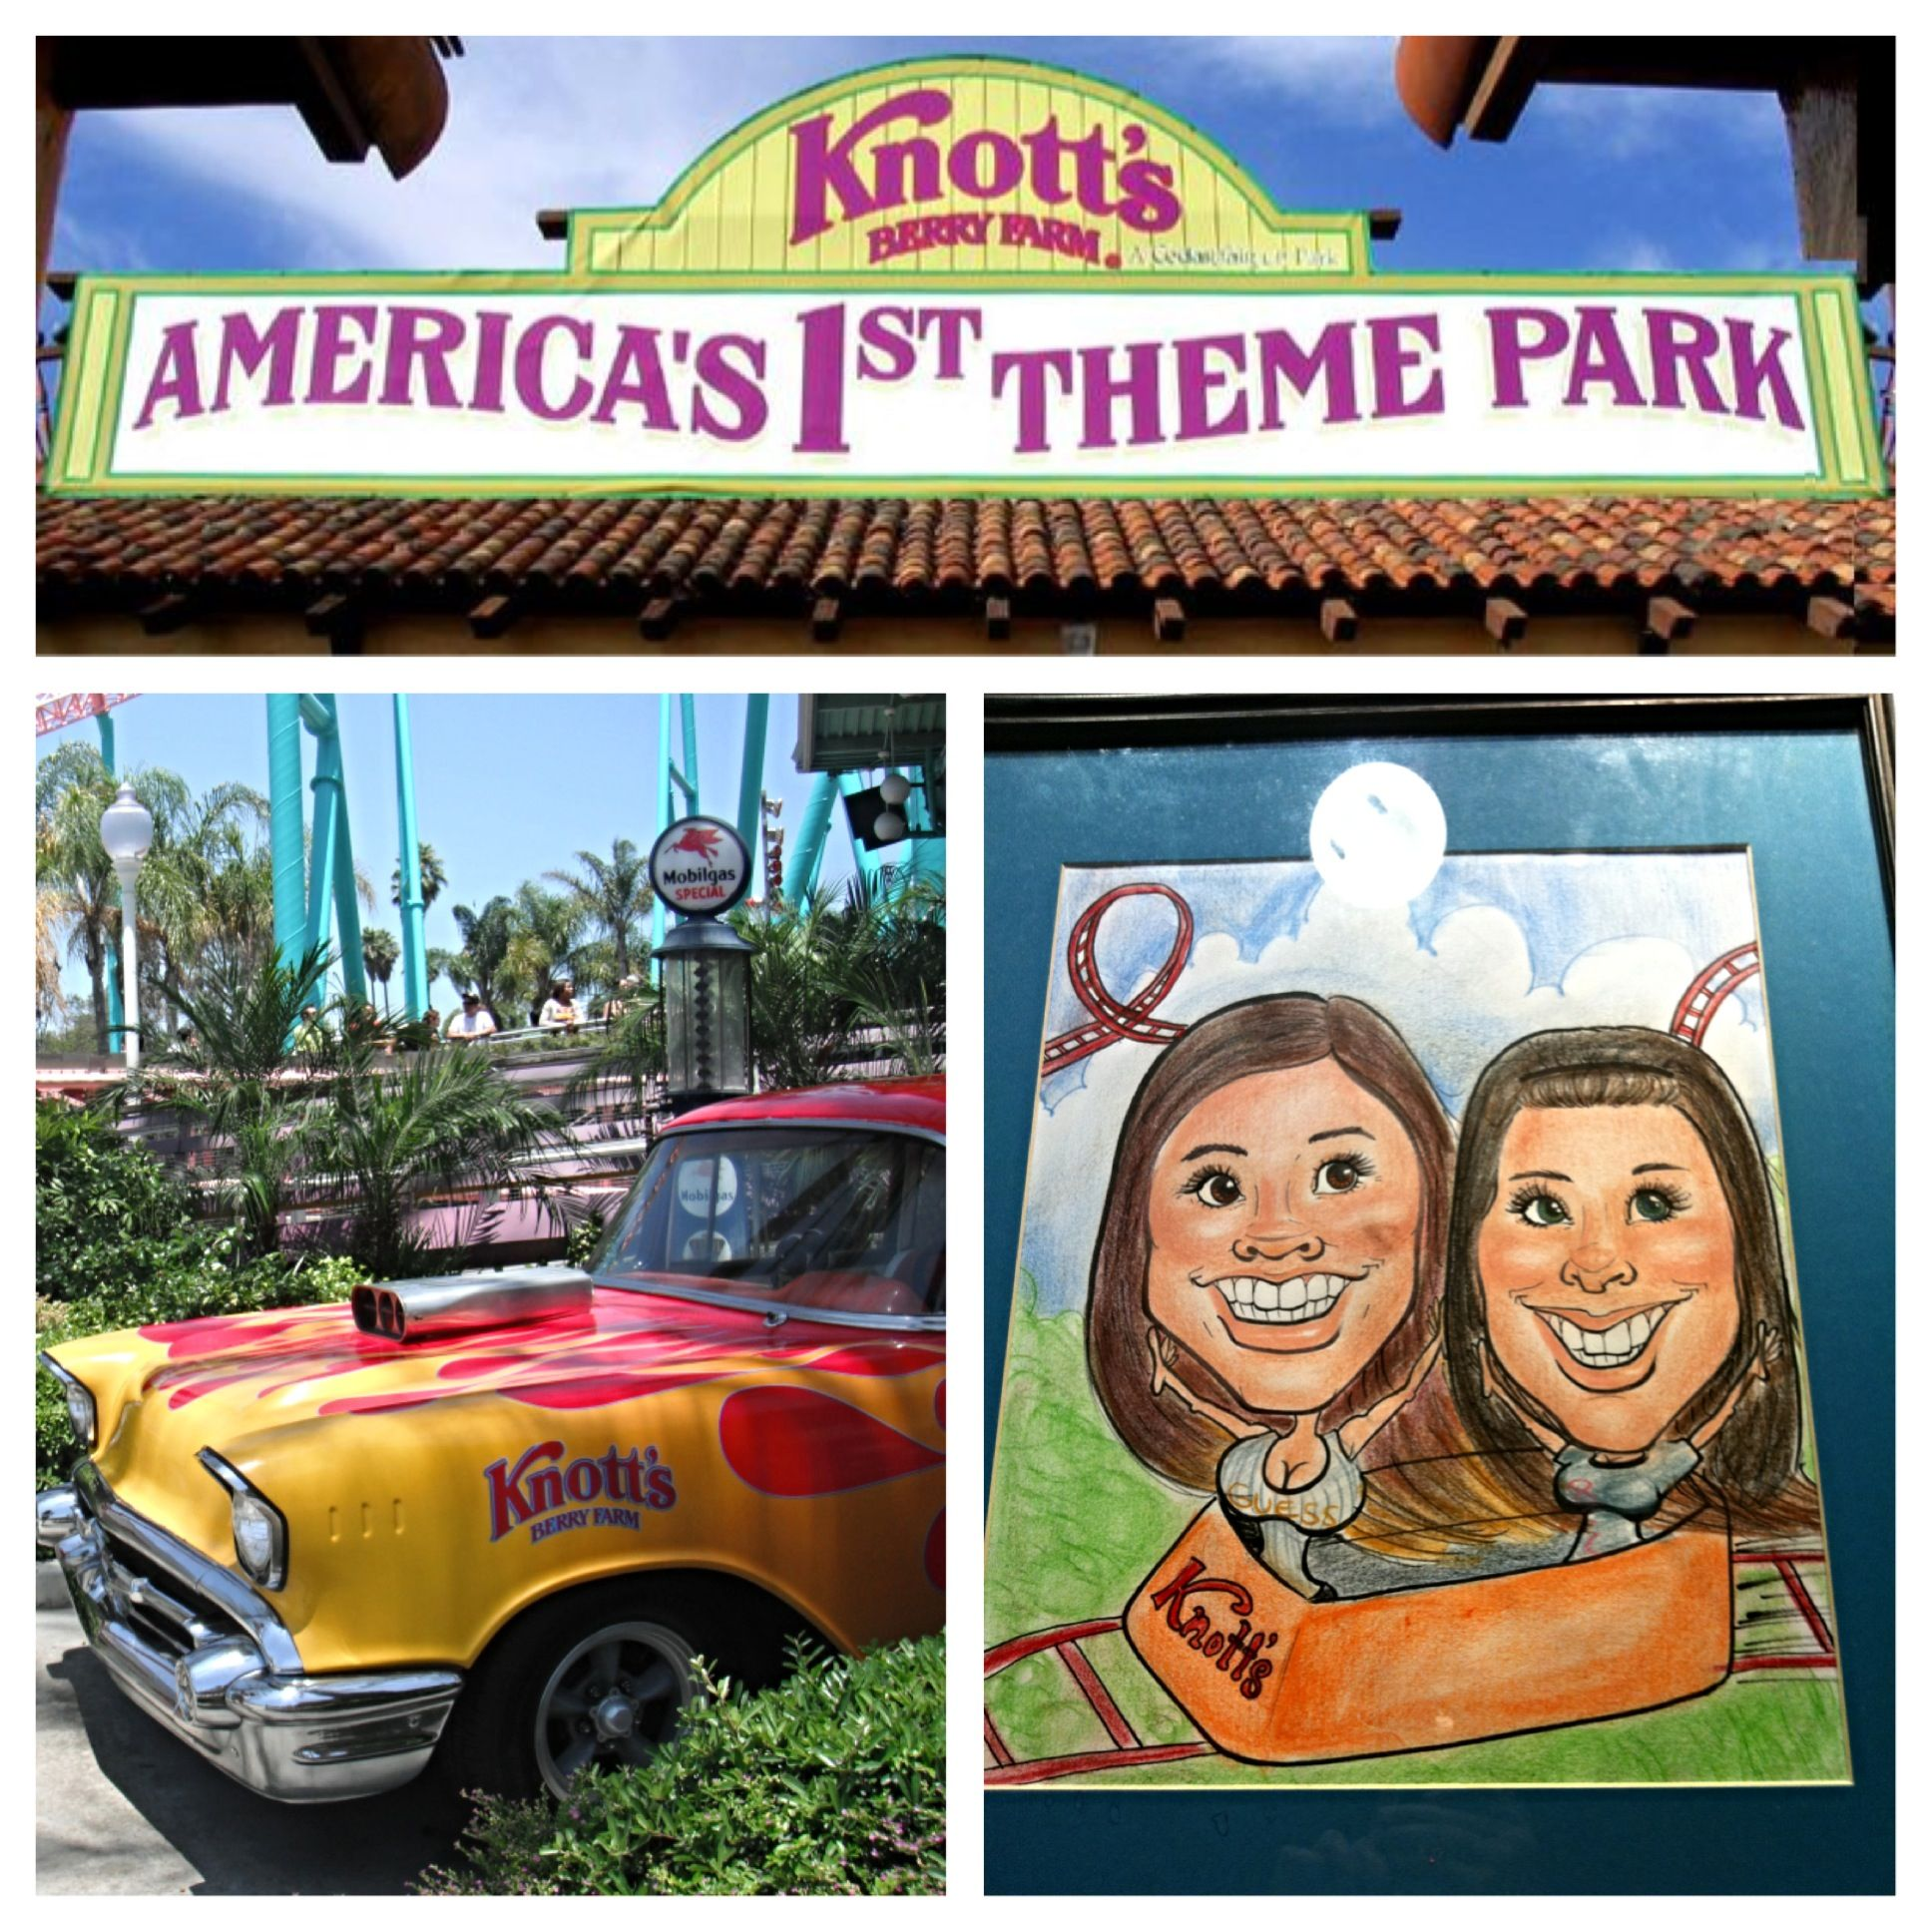 Knottus Berry Farm Buena Park CA firstthemepark calilovin